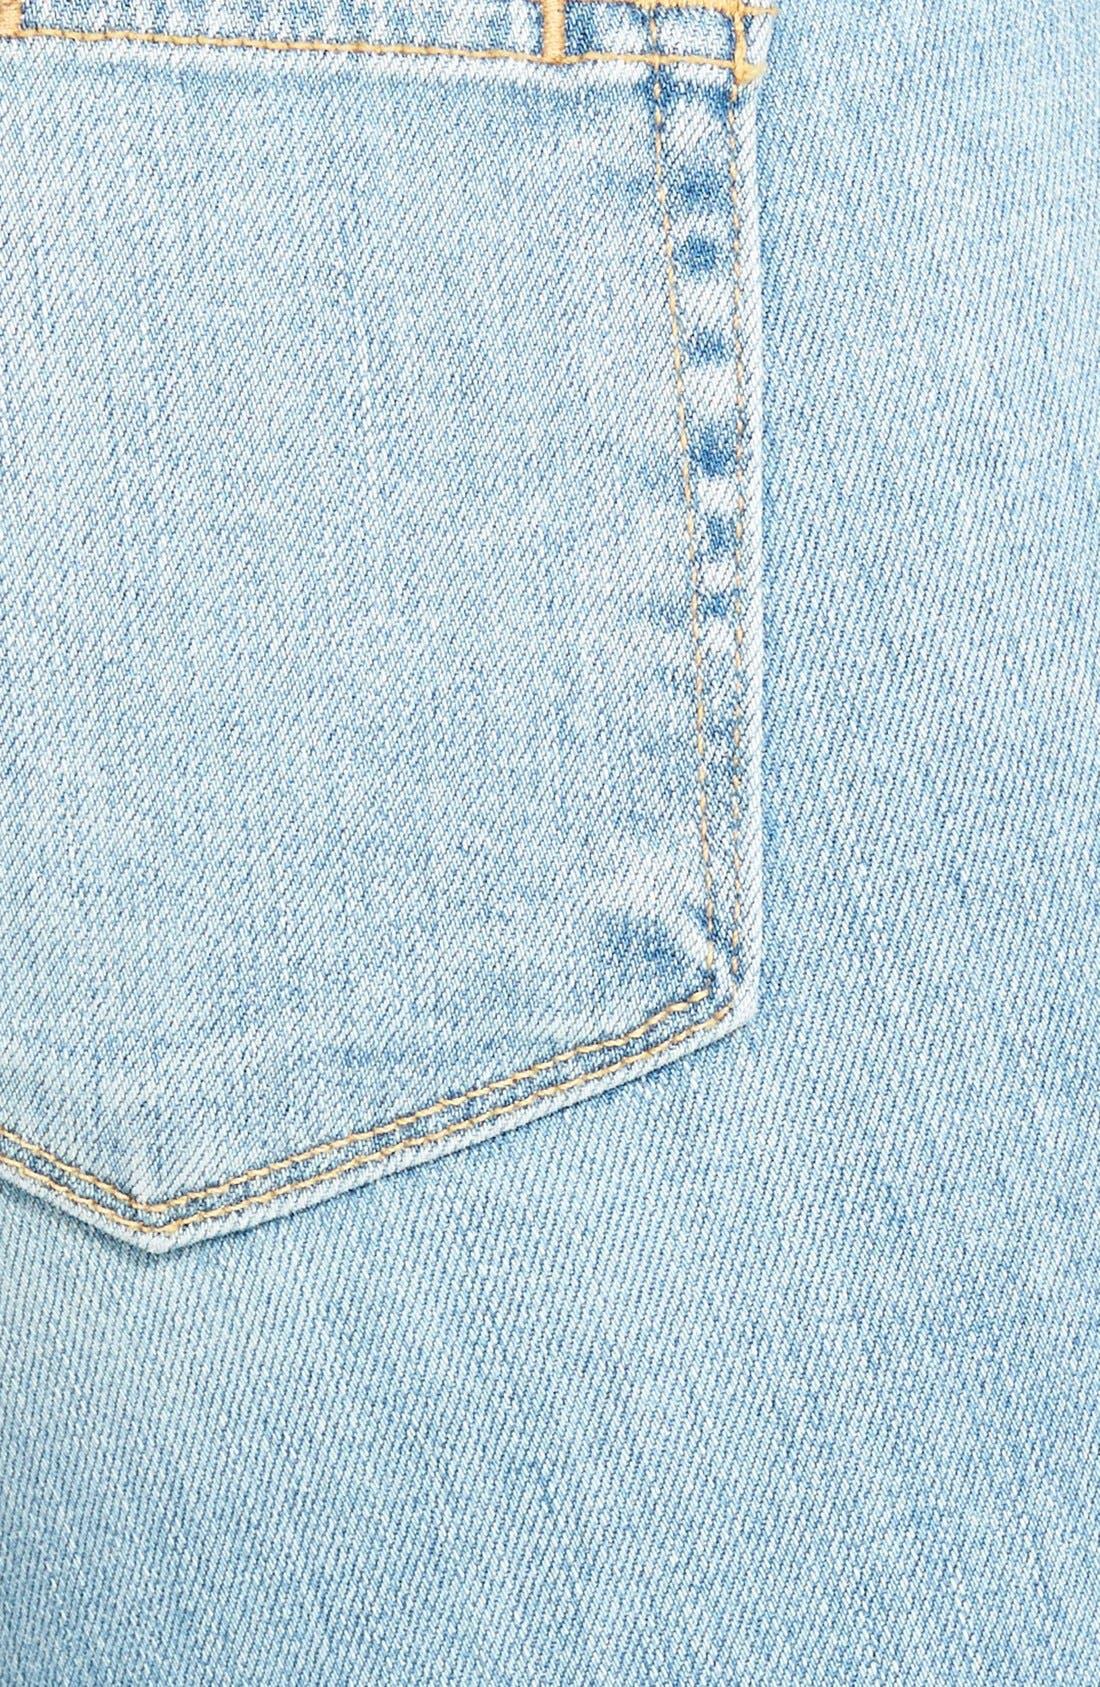 Alternate Image 3  - Paige Denim 'Skyline' Ankle Peg Jeans (Loren Blue)